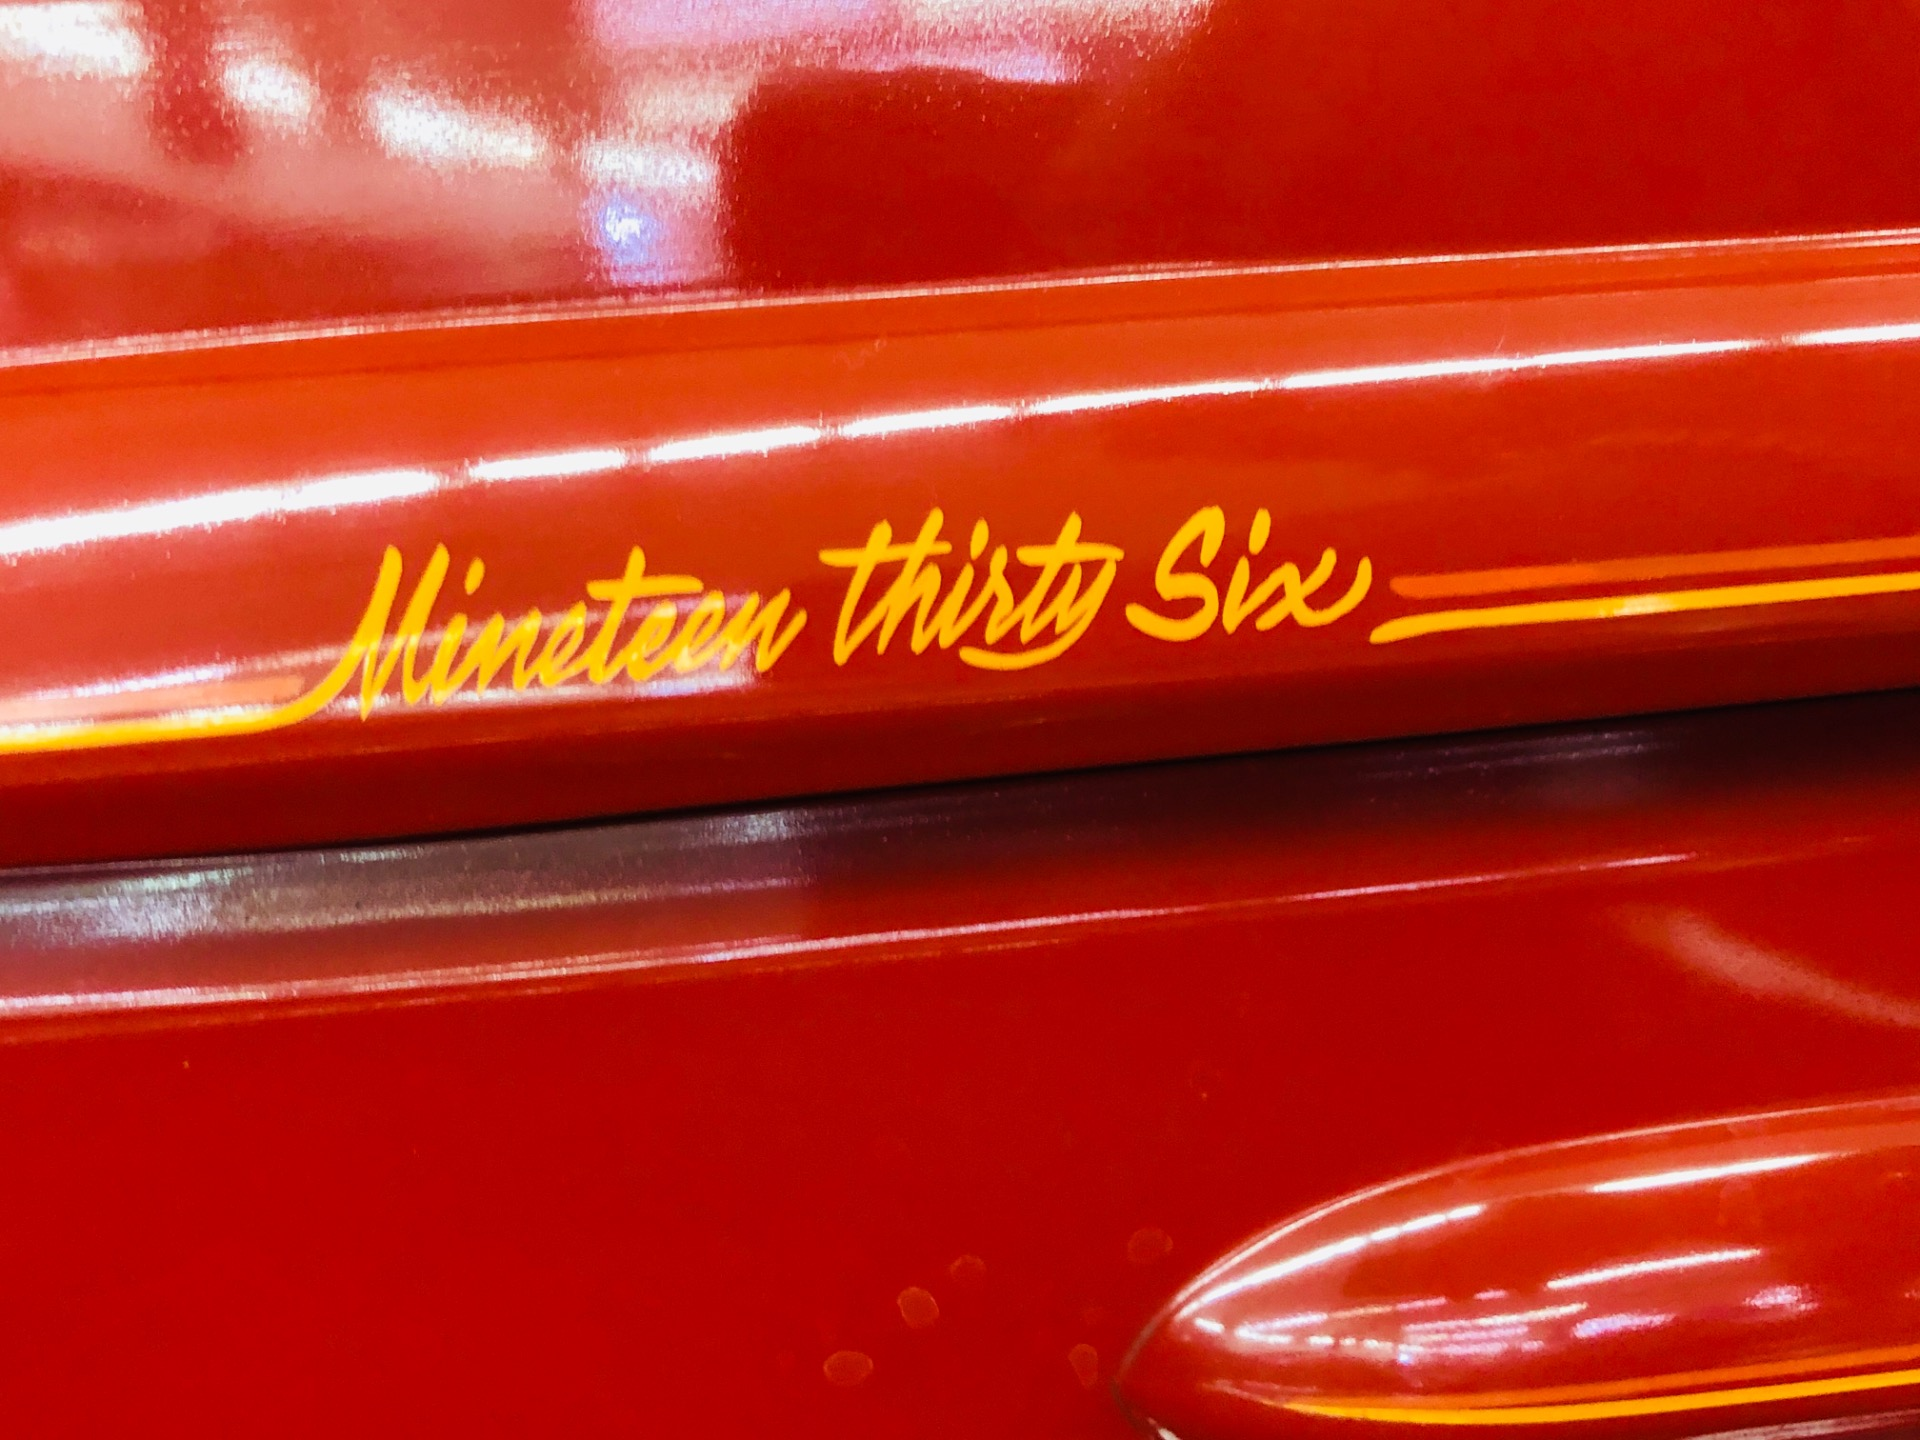 Used 1936 Chevrolet Hot Rod / Street Rod - 2 DOOR SEDAN - VERY RELIABLE - CUSTOM COCA-COLA TRAILER - SEE VIDEO | Mundelein, IL